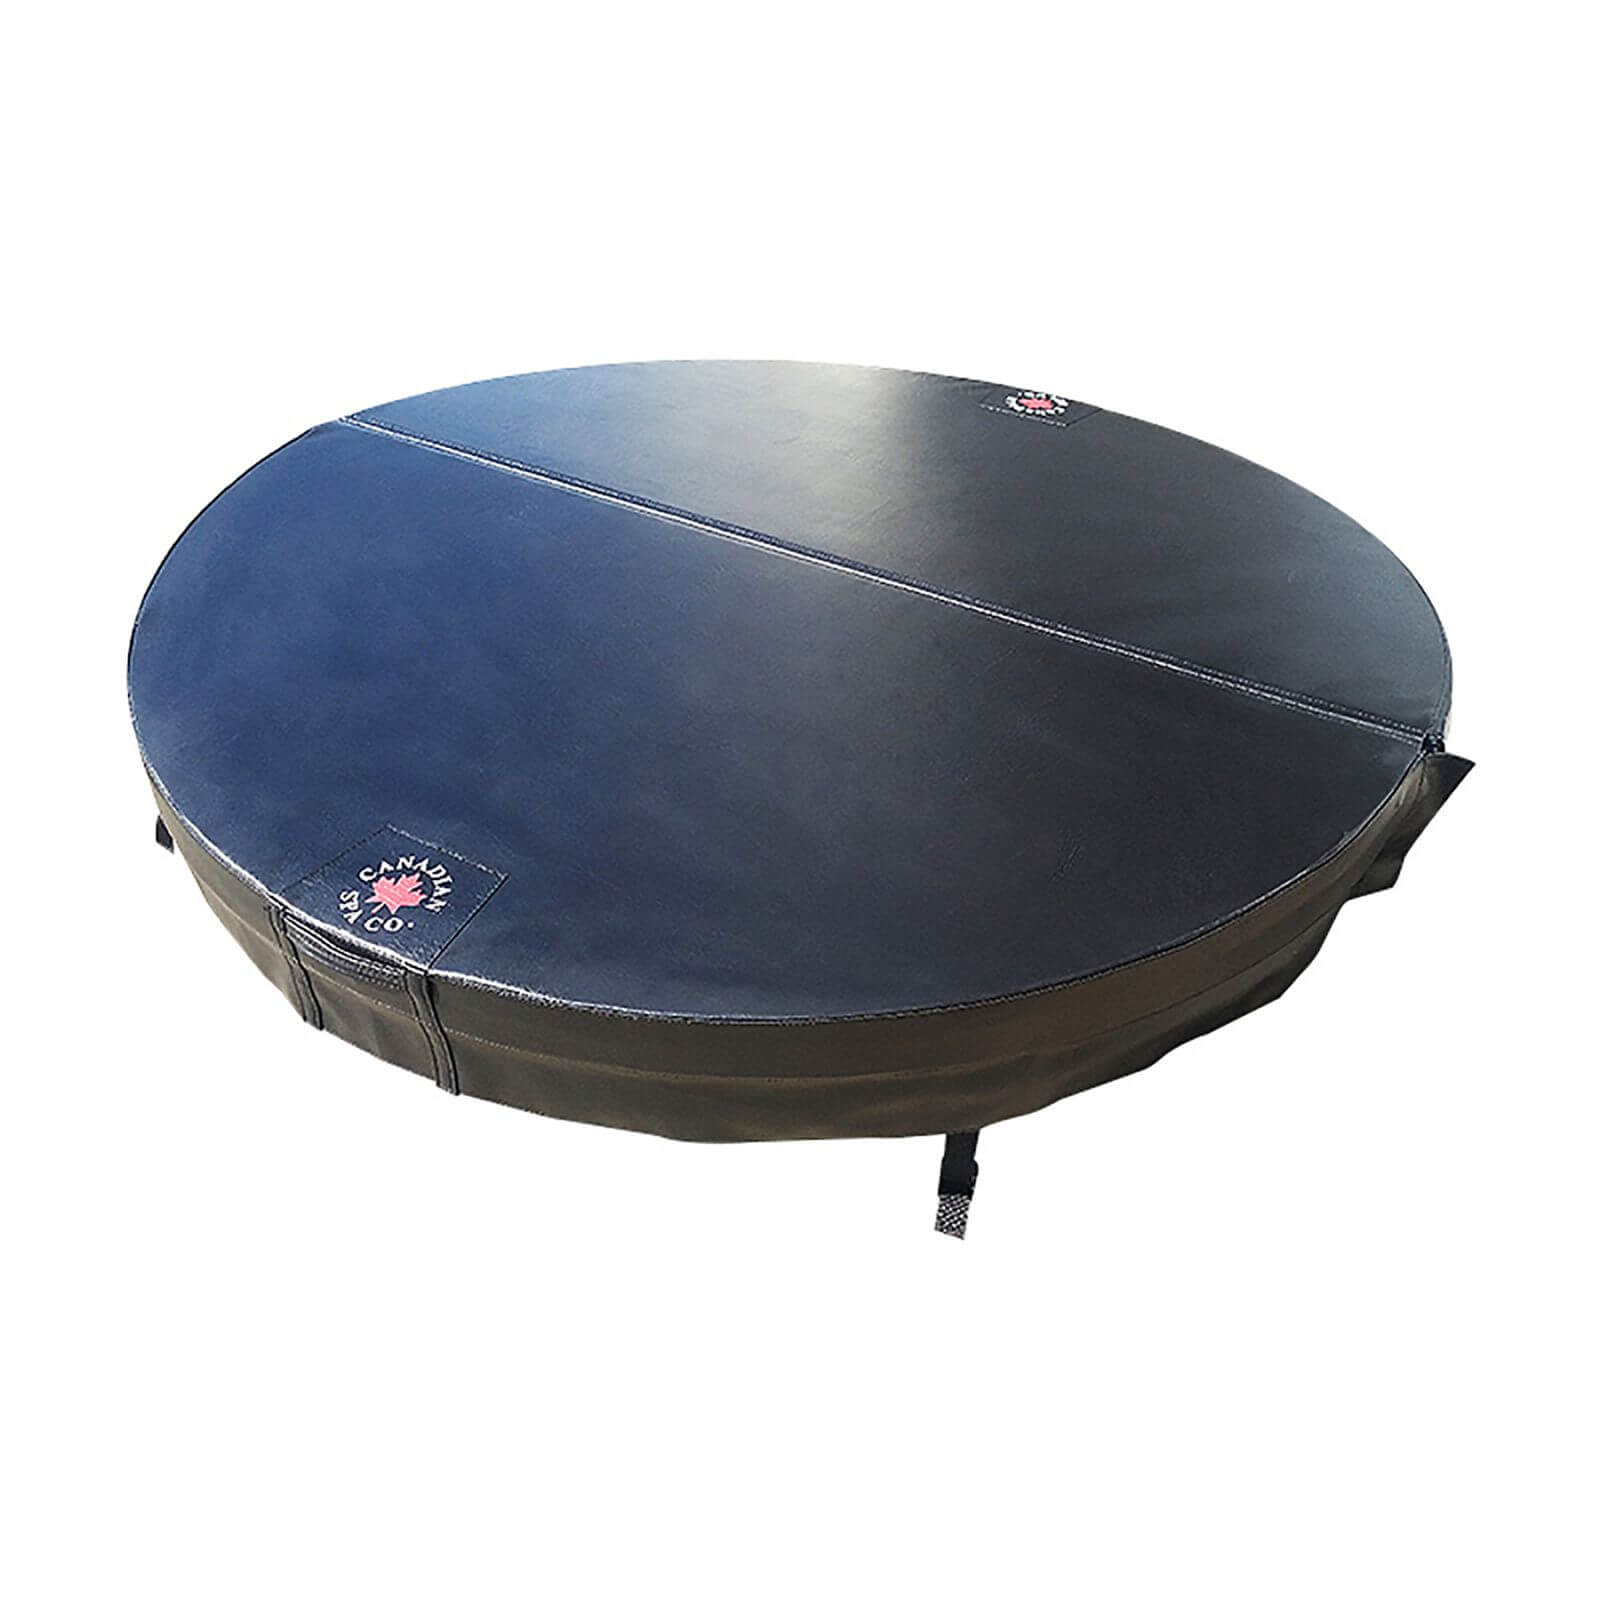 Canadian Spa Rio Grande 2 Upgrade Hot Tub Cover